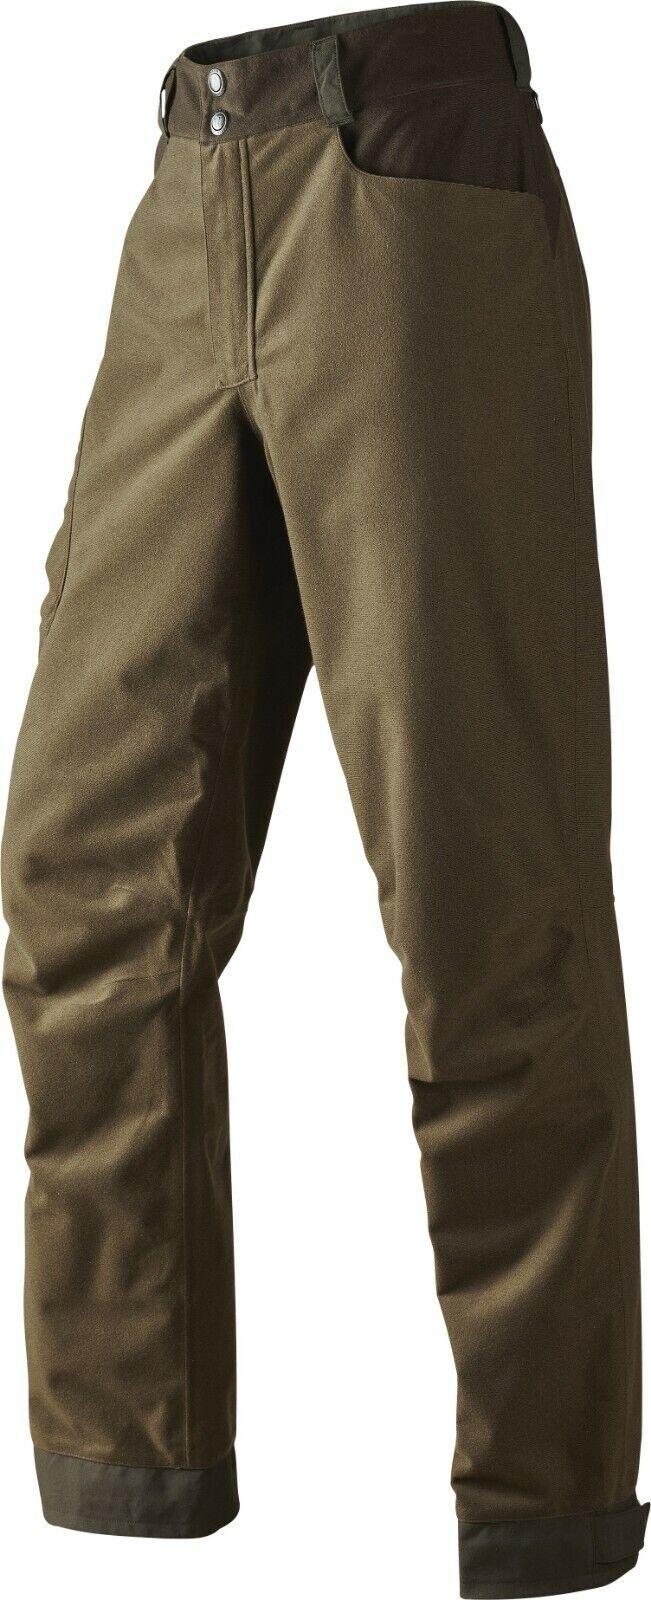 Harkila Tuning Waterproof Gore-Tex Shooting Trousers